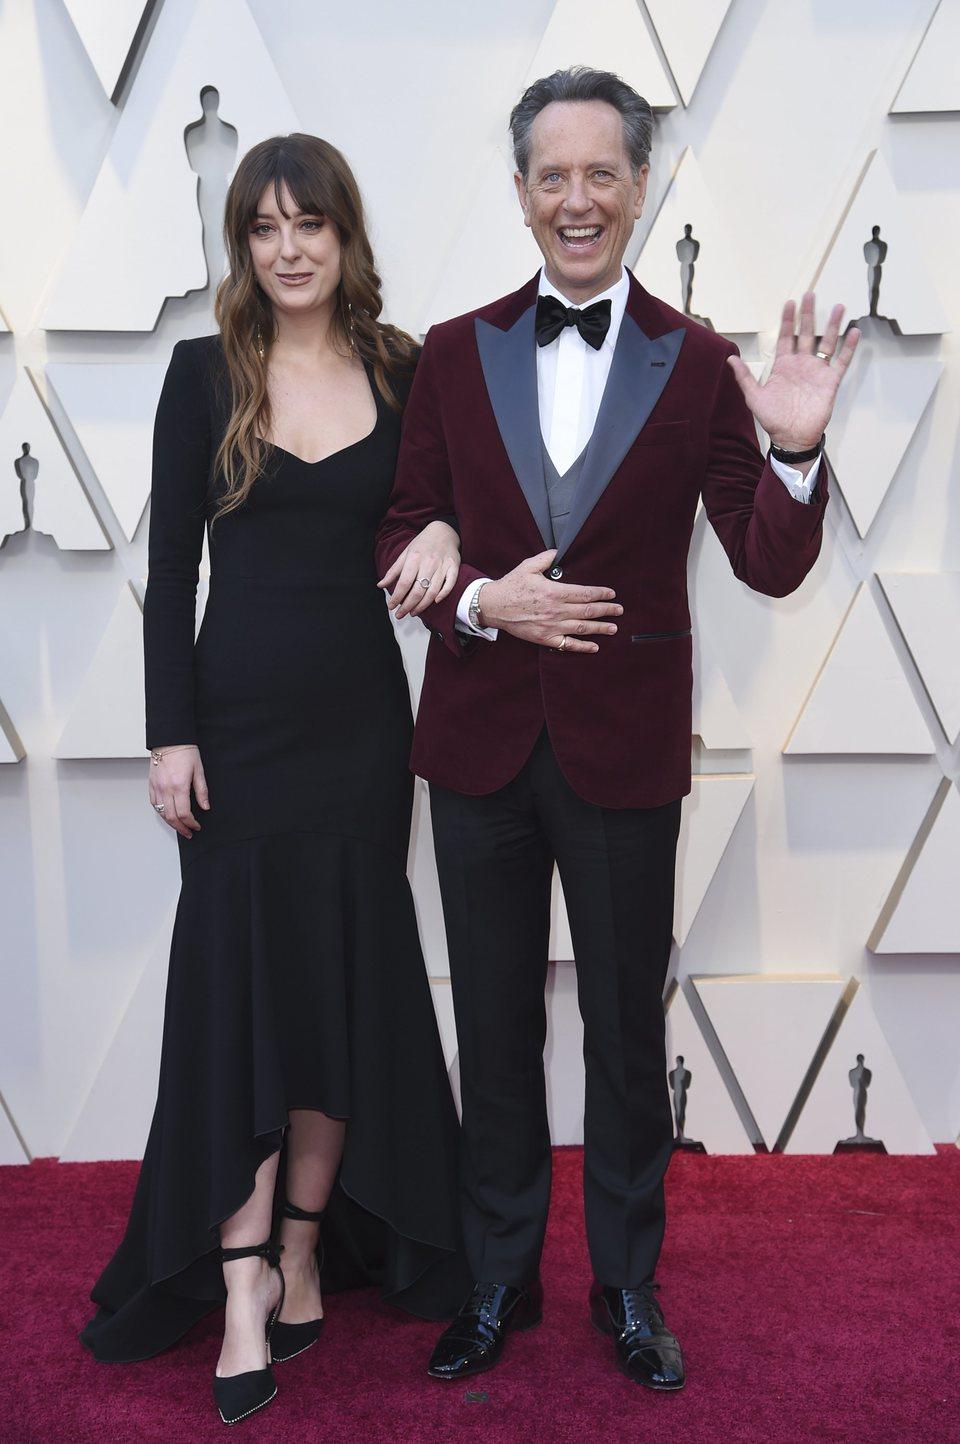 Richard E. Grant and Olivia Grant at the Oscars 2019 red carpet